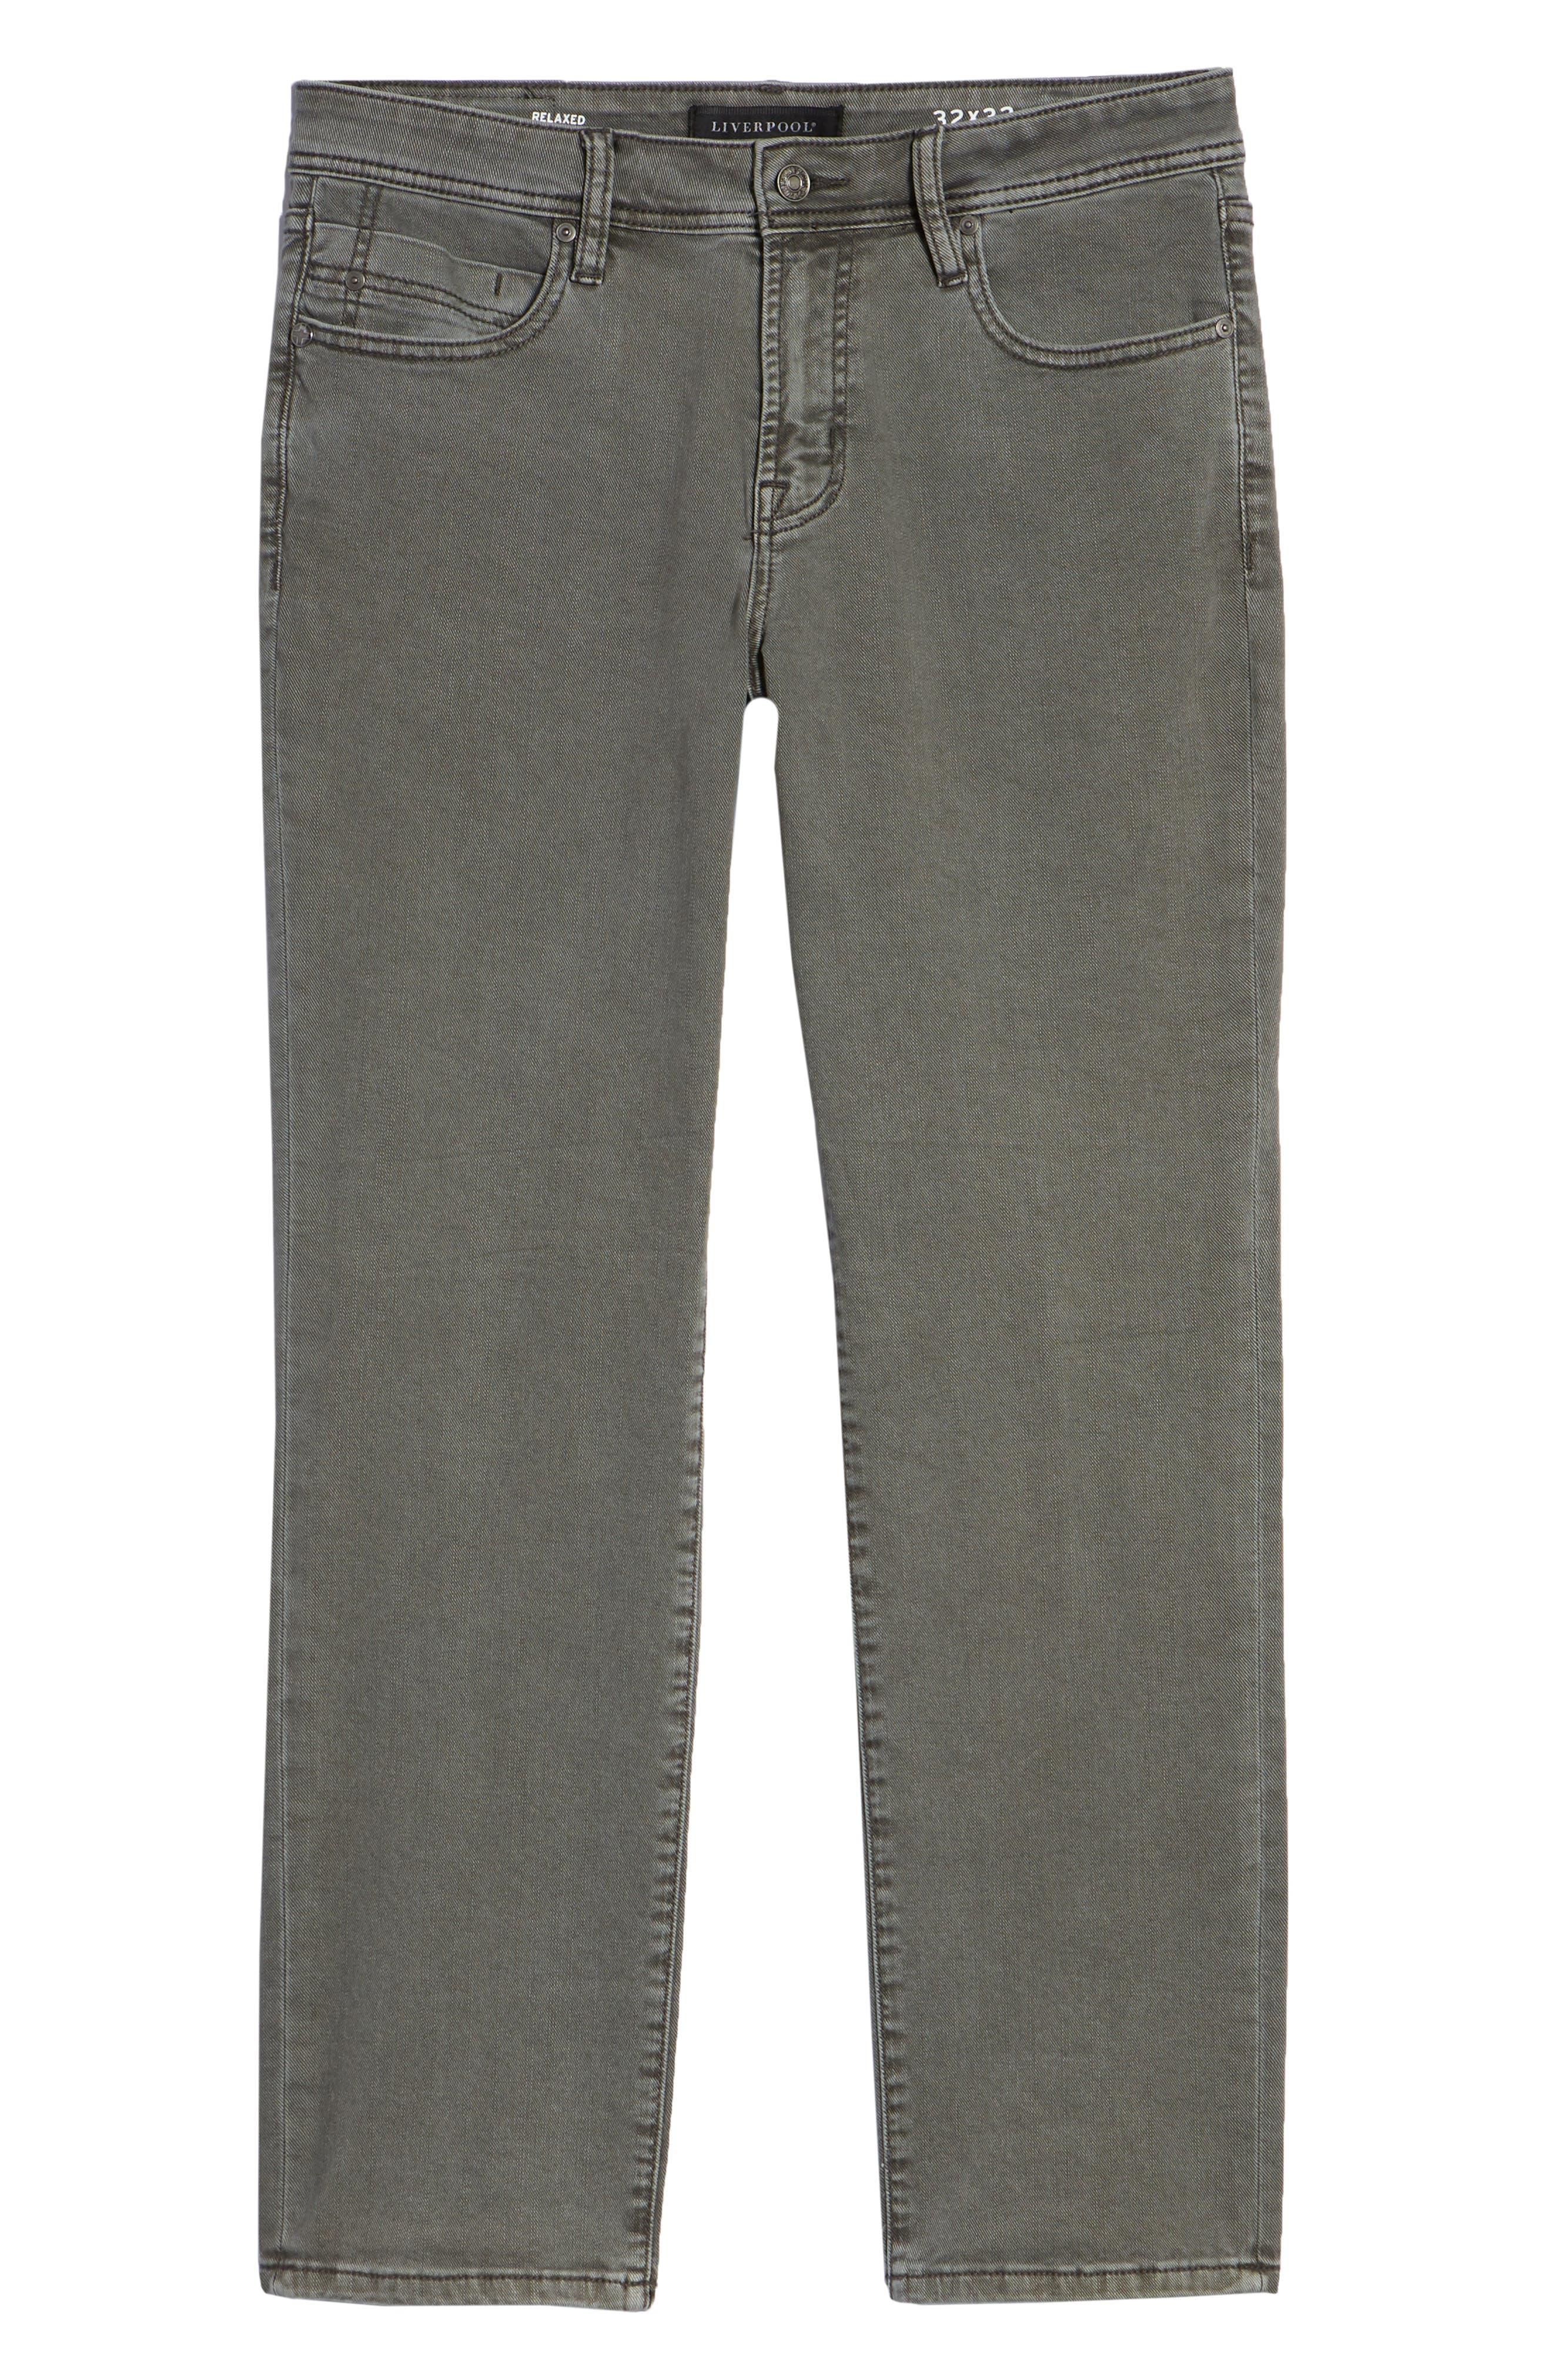 Regent Relaxed Fit Jeans,                             Alternate thumbnail 6, color,                             GUNMETAL